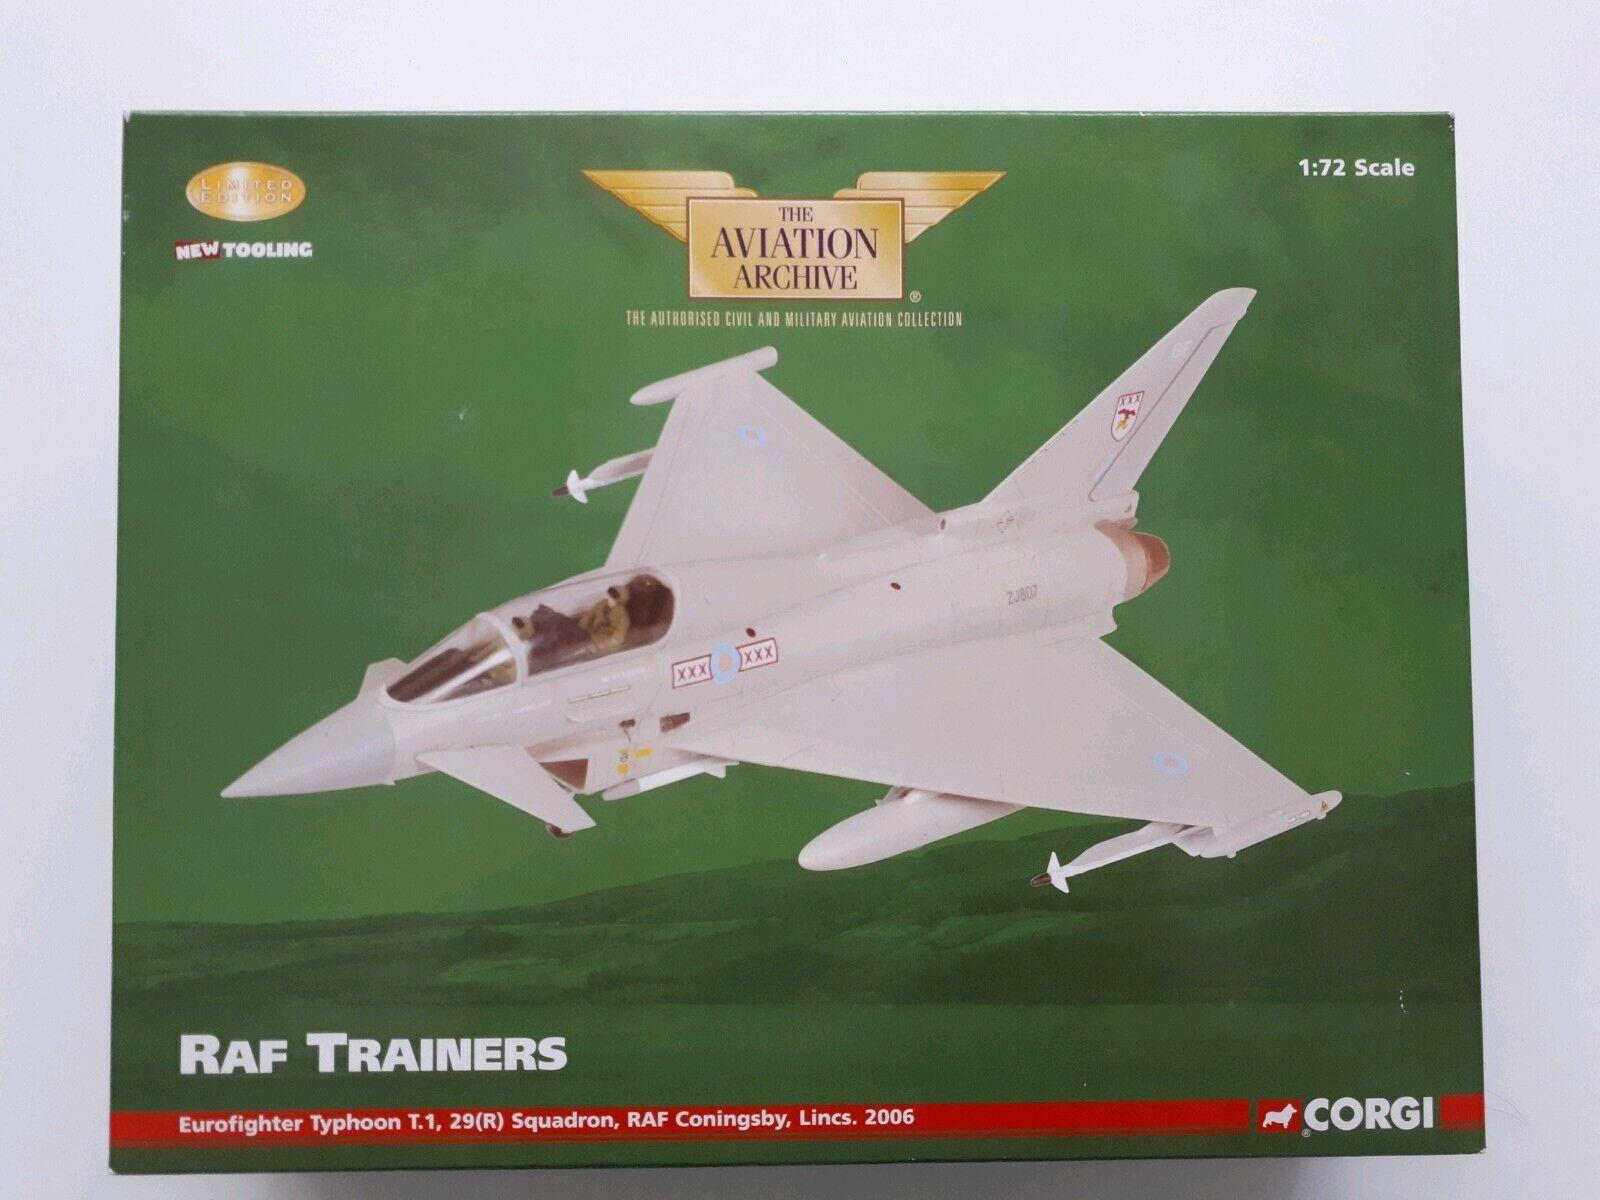 RAF Trainer Eurofighter Typhoon T.1, 29 (R) Sqd., RAF Coningsby, Lincs. AA36402